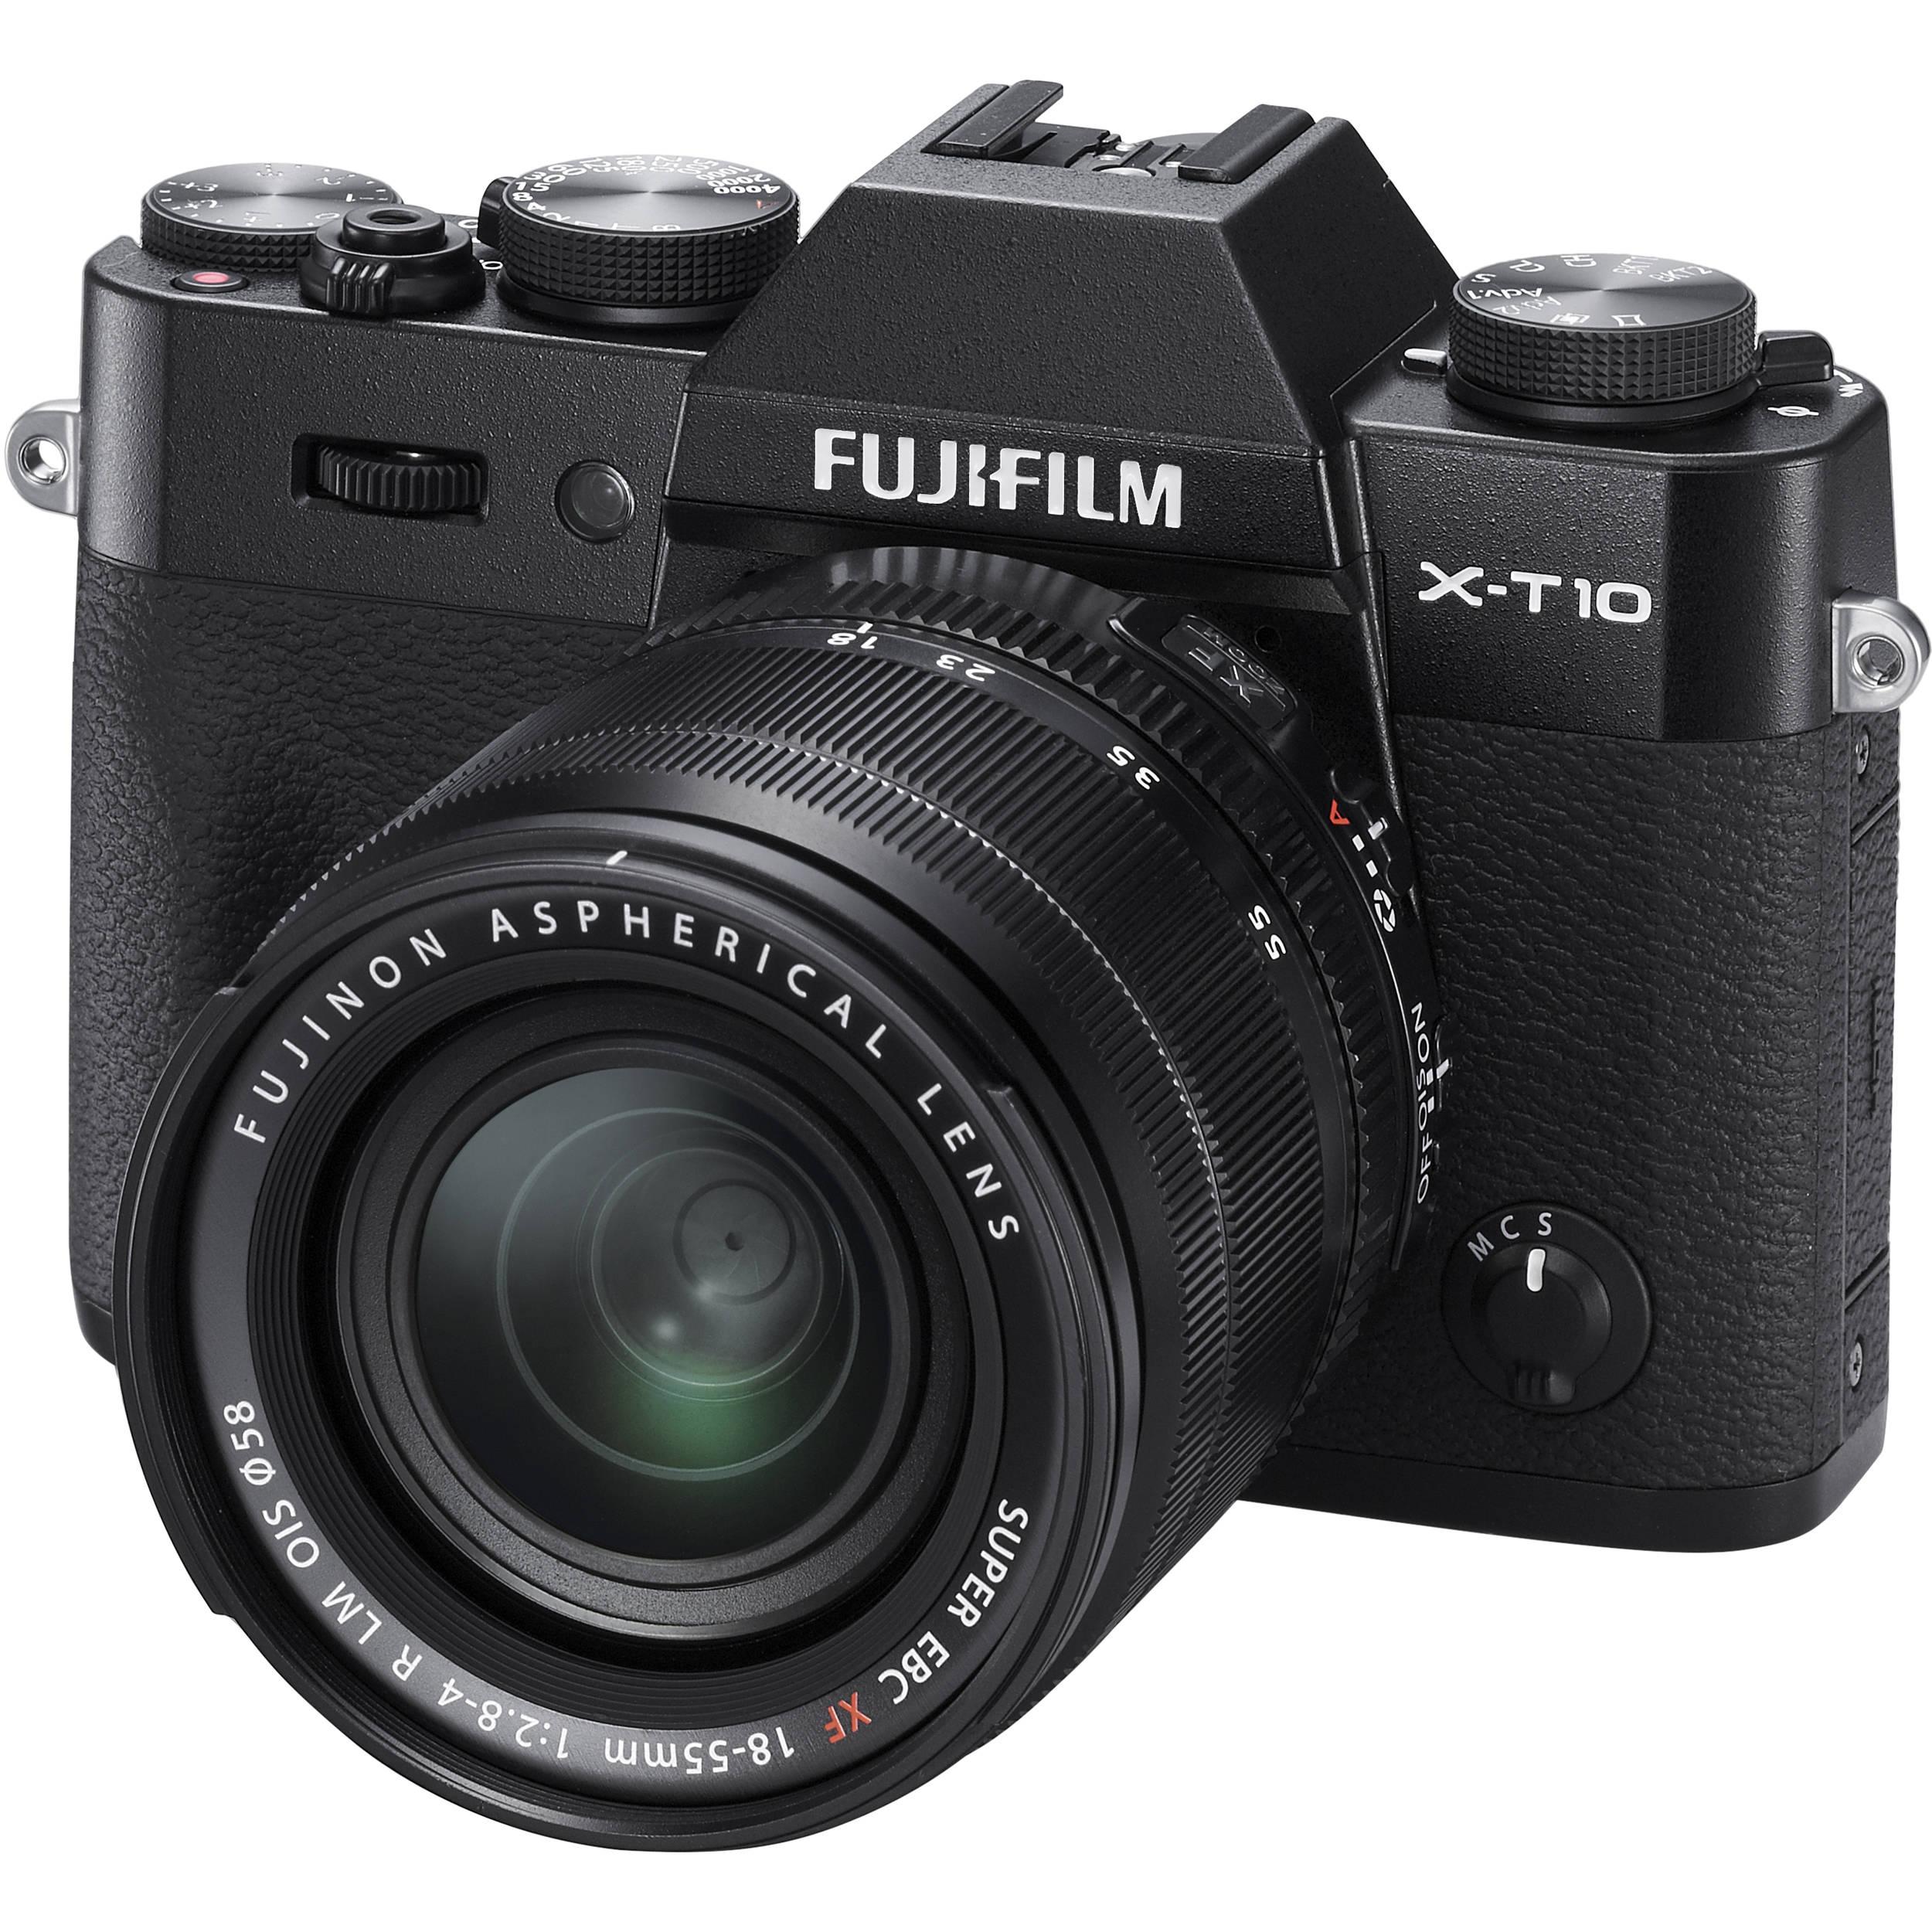 Fuji X-T10 18-55mm